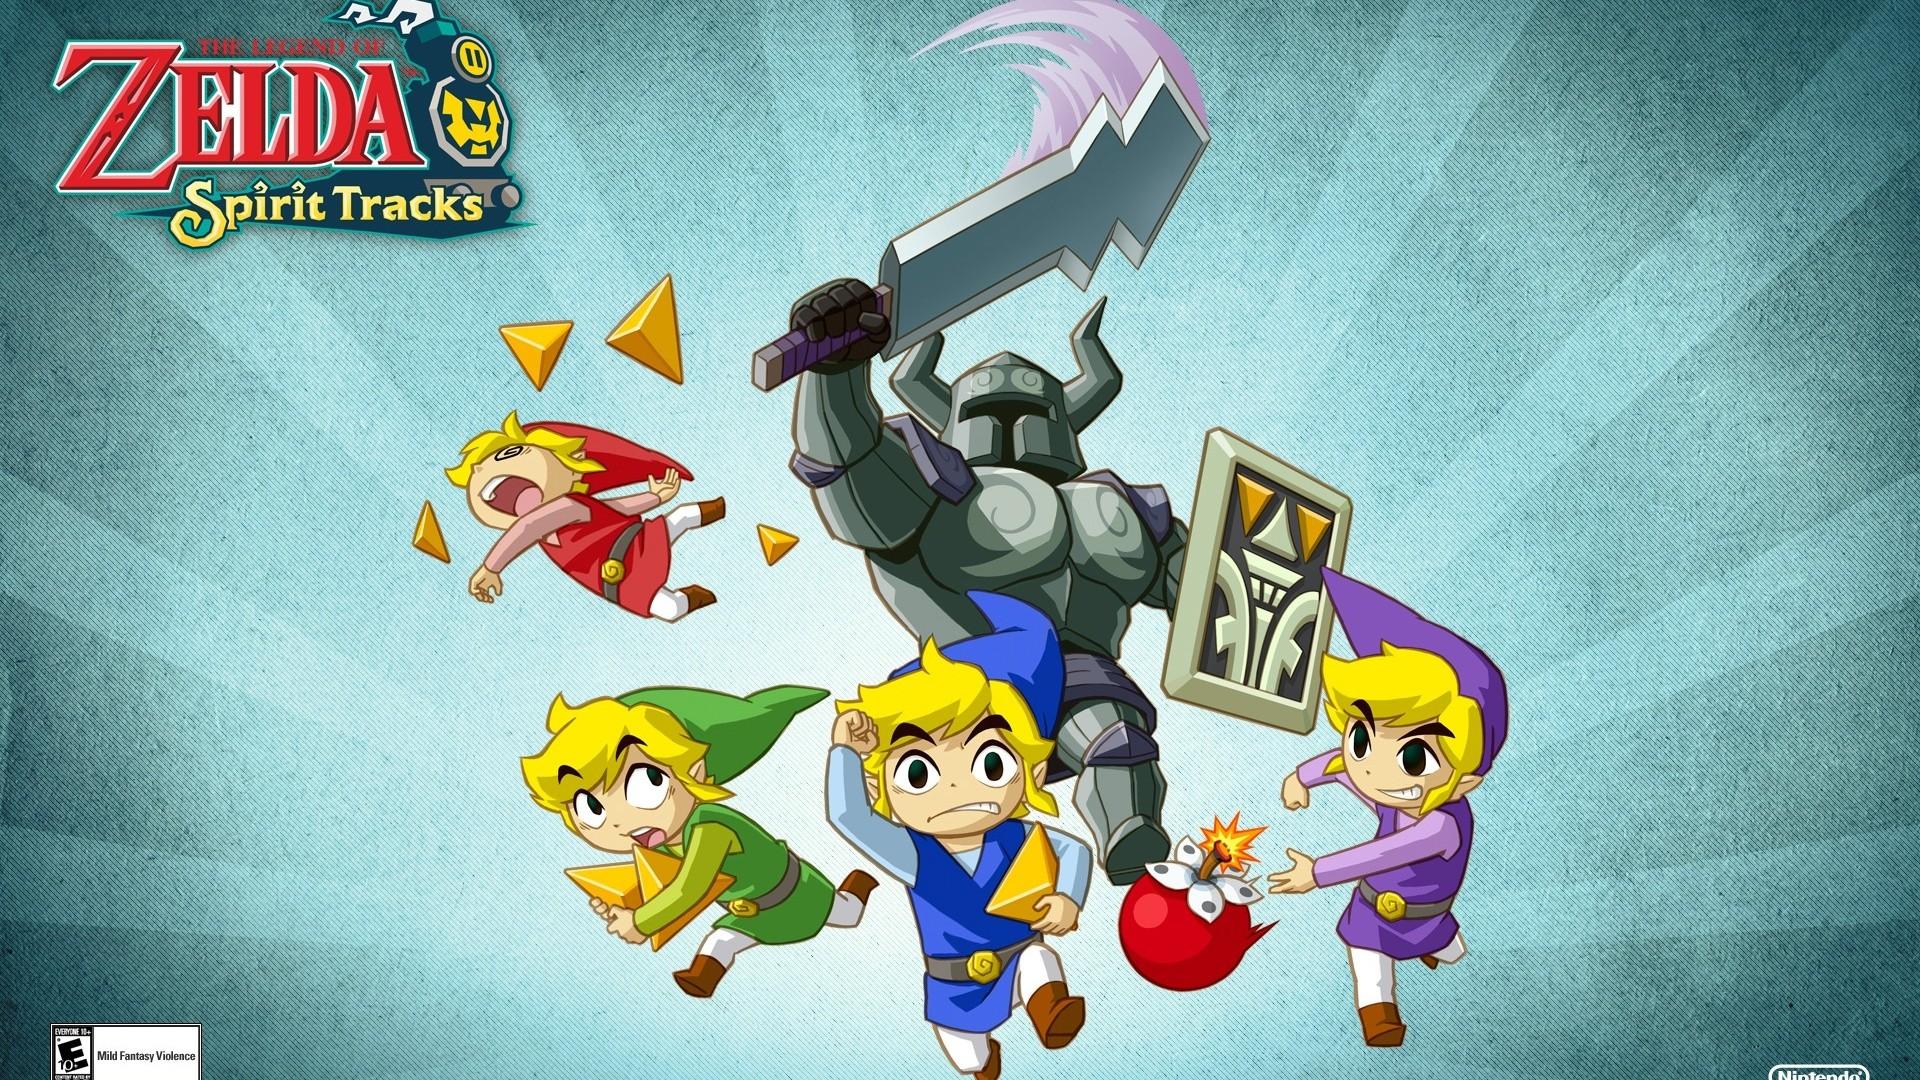 The Legend Of Zelda The Wind Waker Hd Wallpapers Hd For Desktop